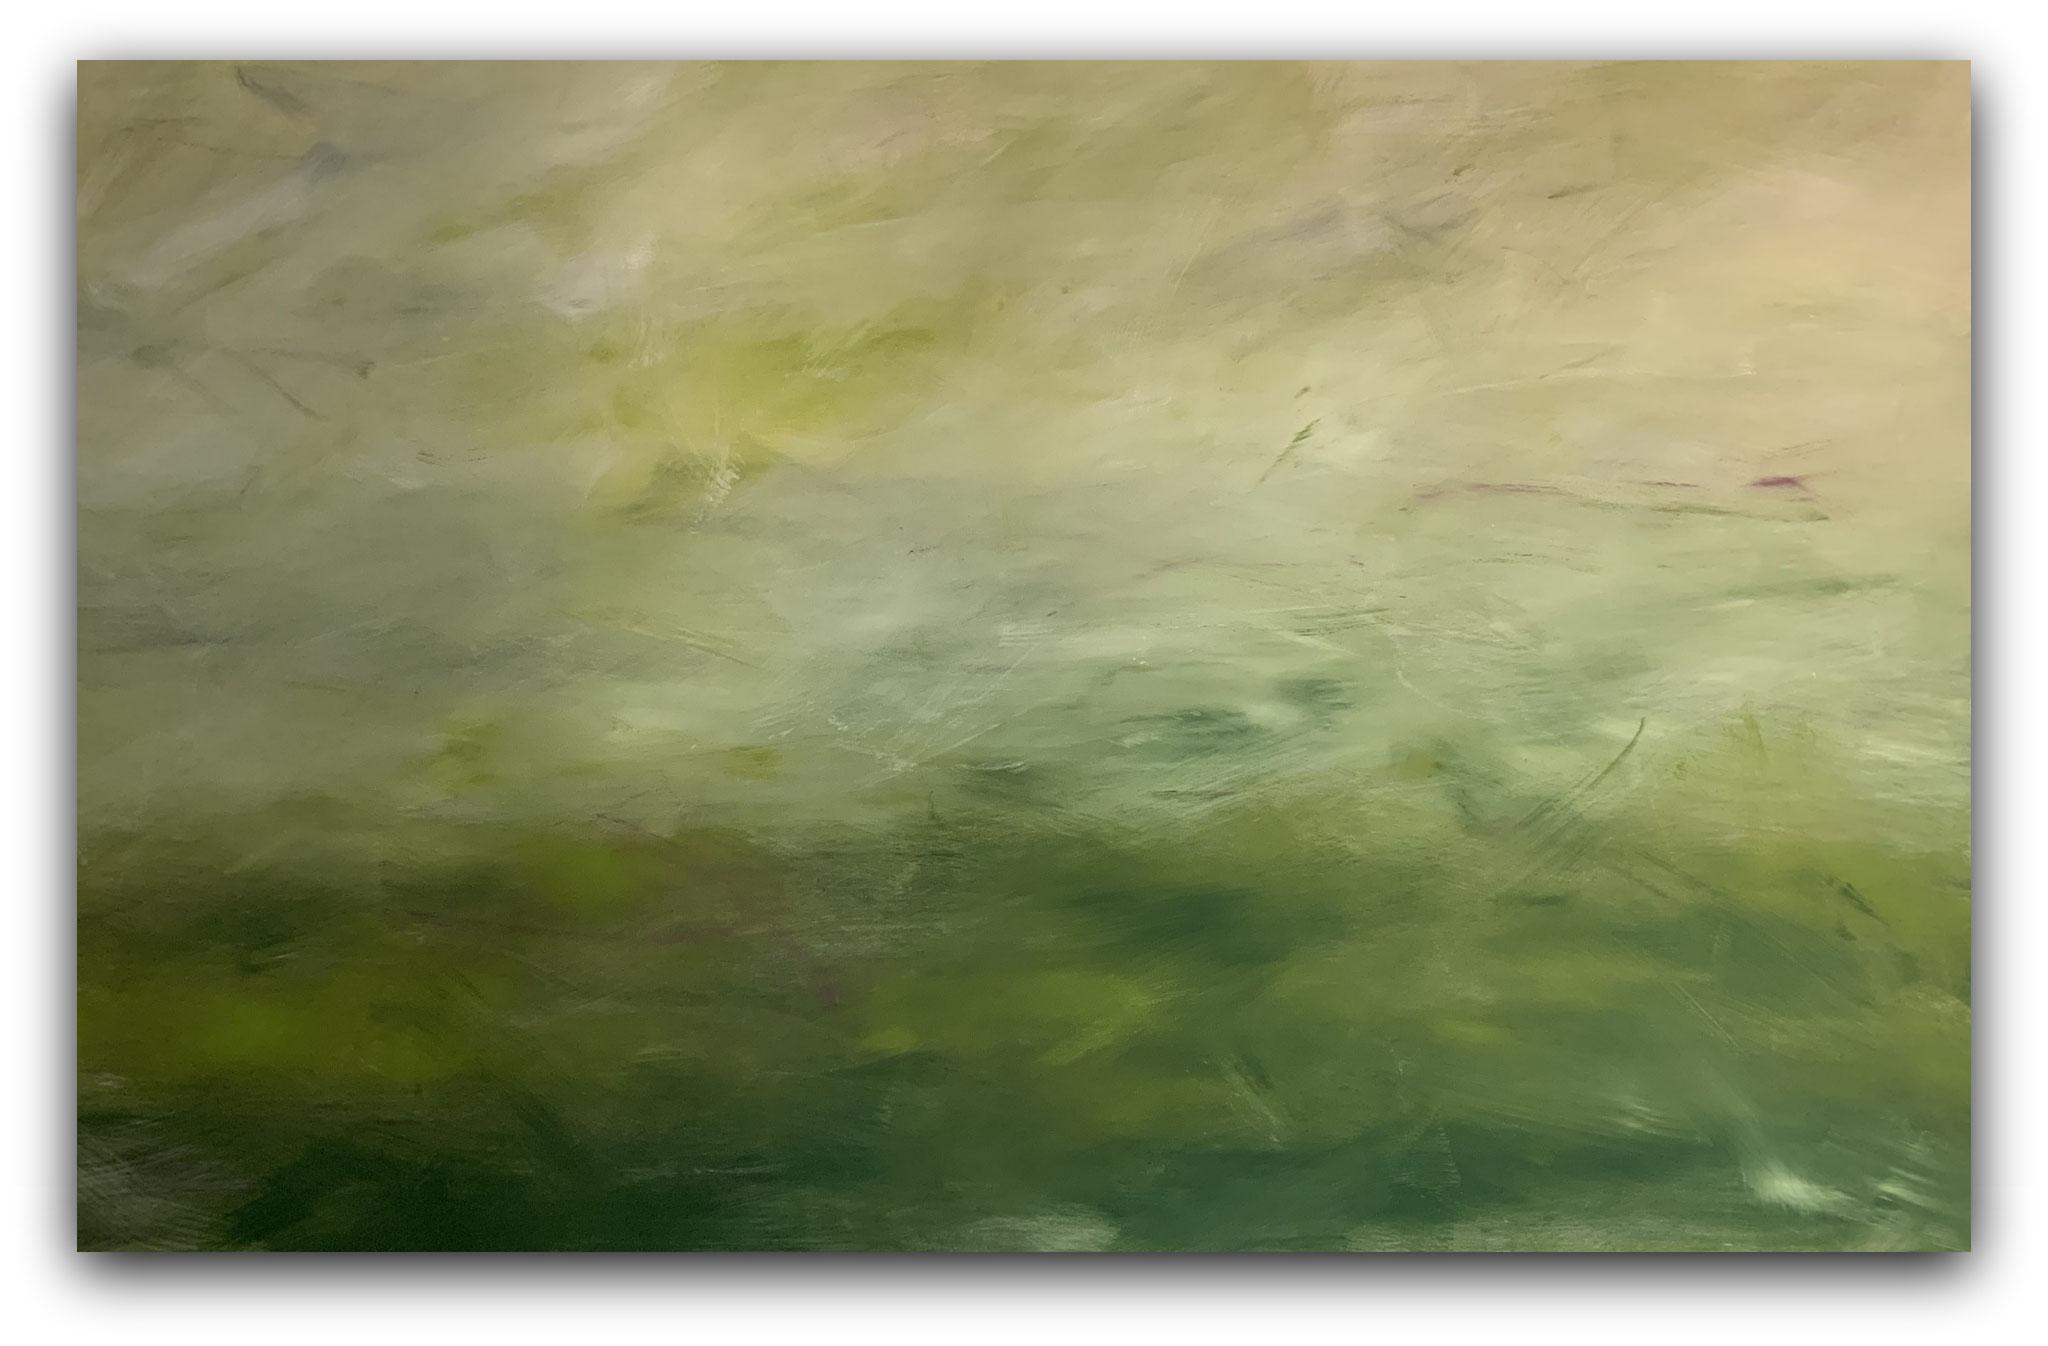 Ybbsufer 120 x 190cm / Acryl, Dispersion auf Leinen